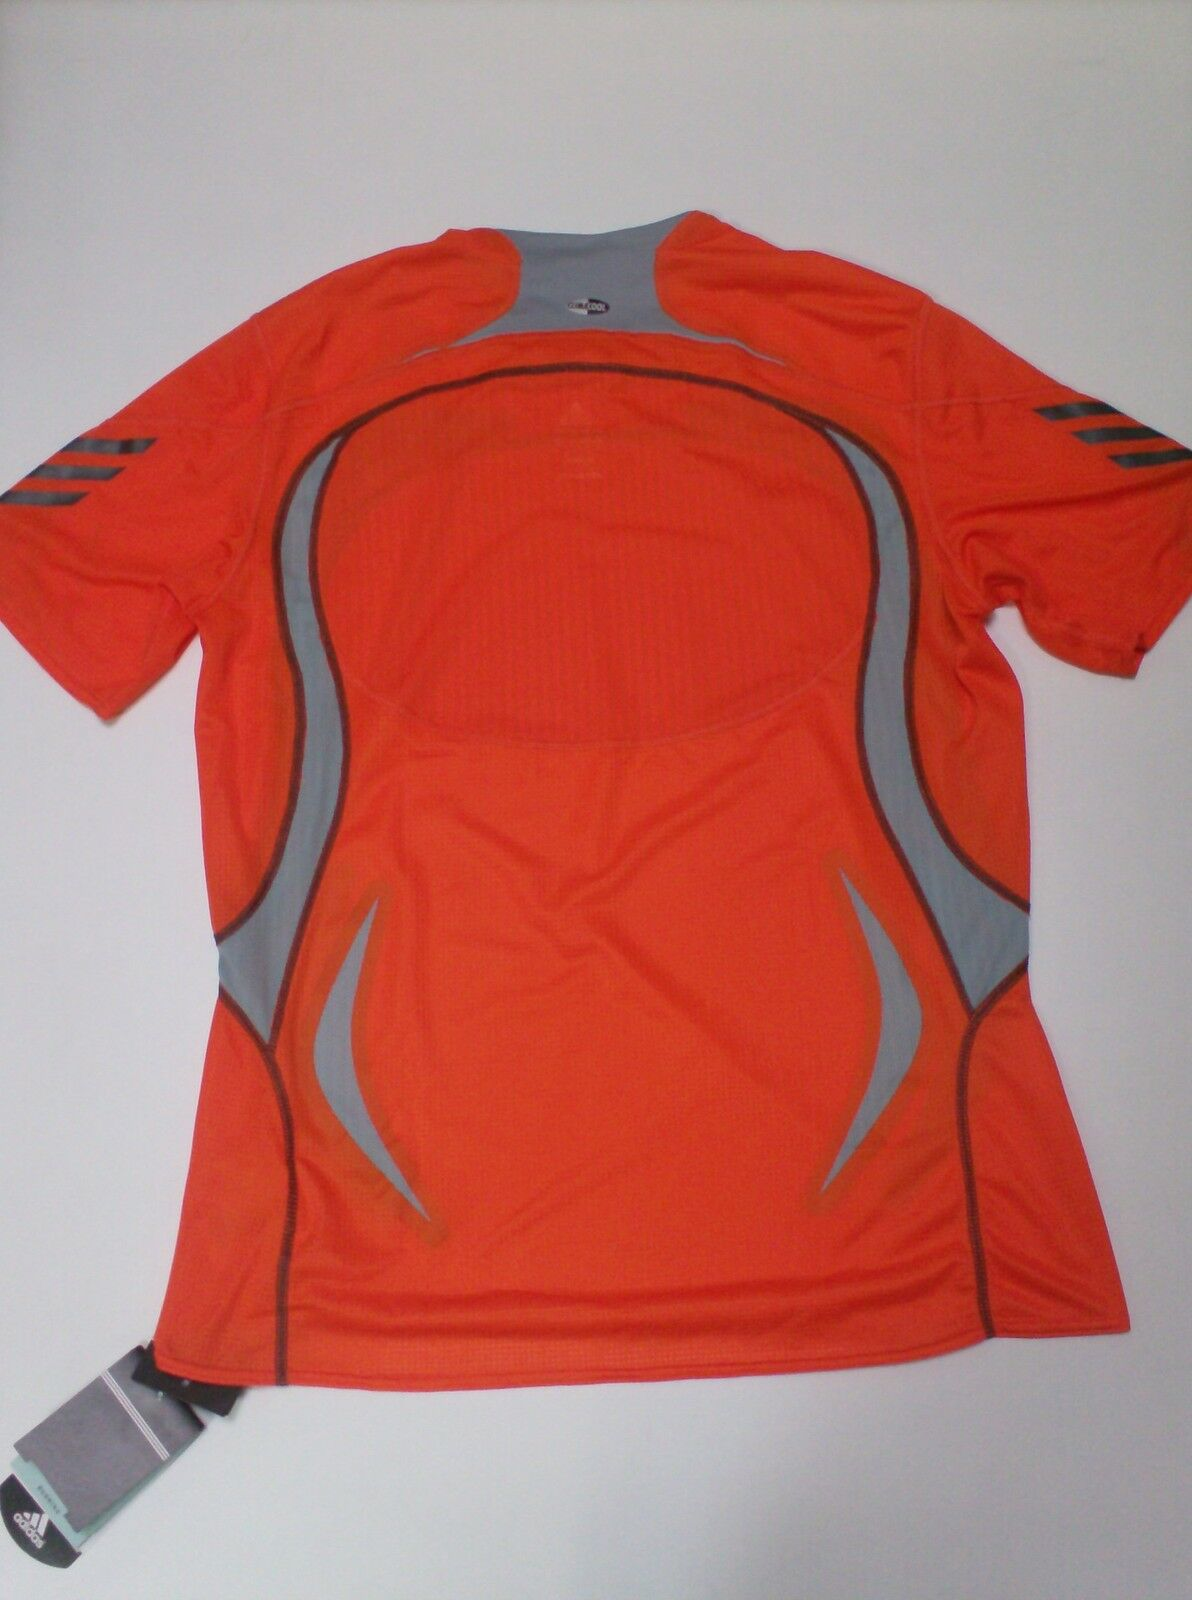 Adidas Jogging Maglietta Running Maglia da Corsa Adistar SS  TEE L 072063  presa